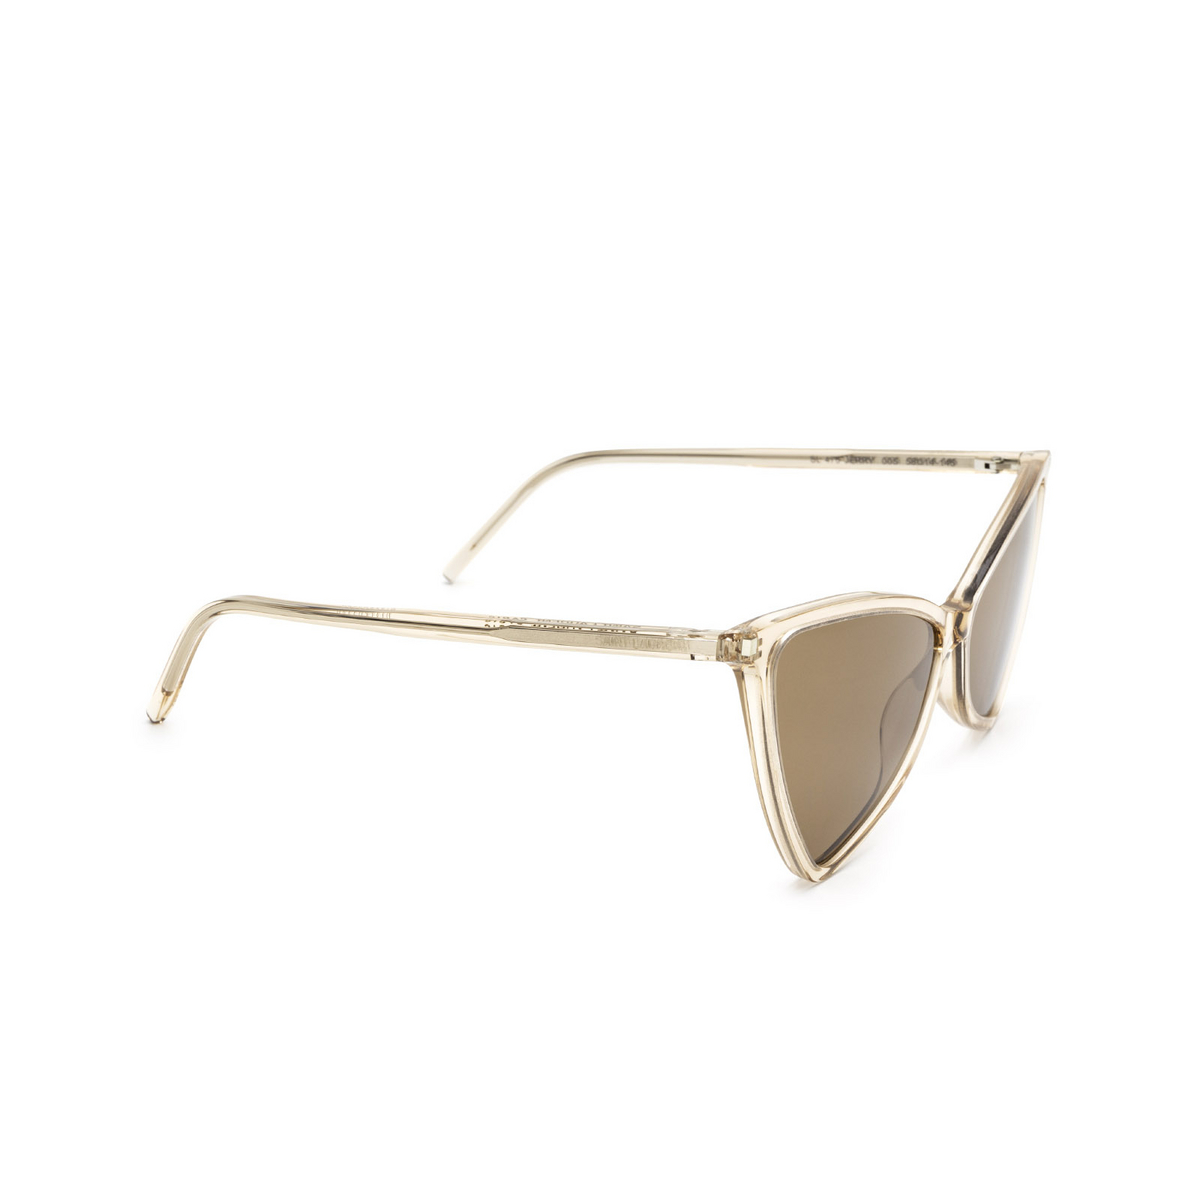 Saint Laurent® Irregular Sunglasses: Jerry SL 475 color Nude 005 - three-quarters view.